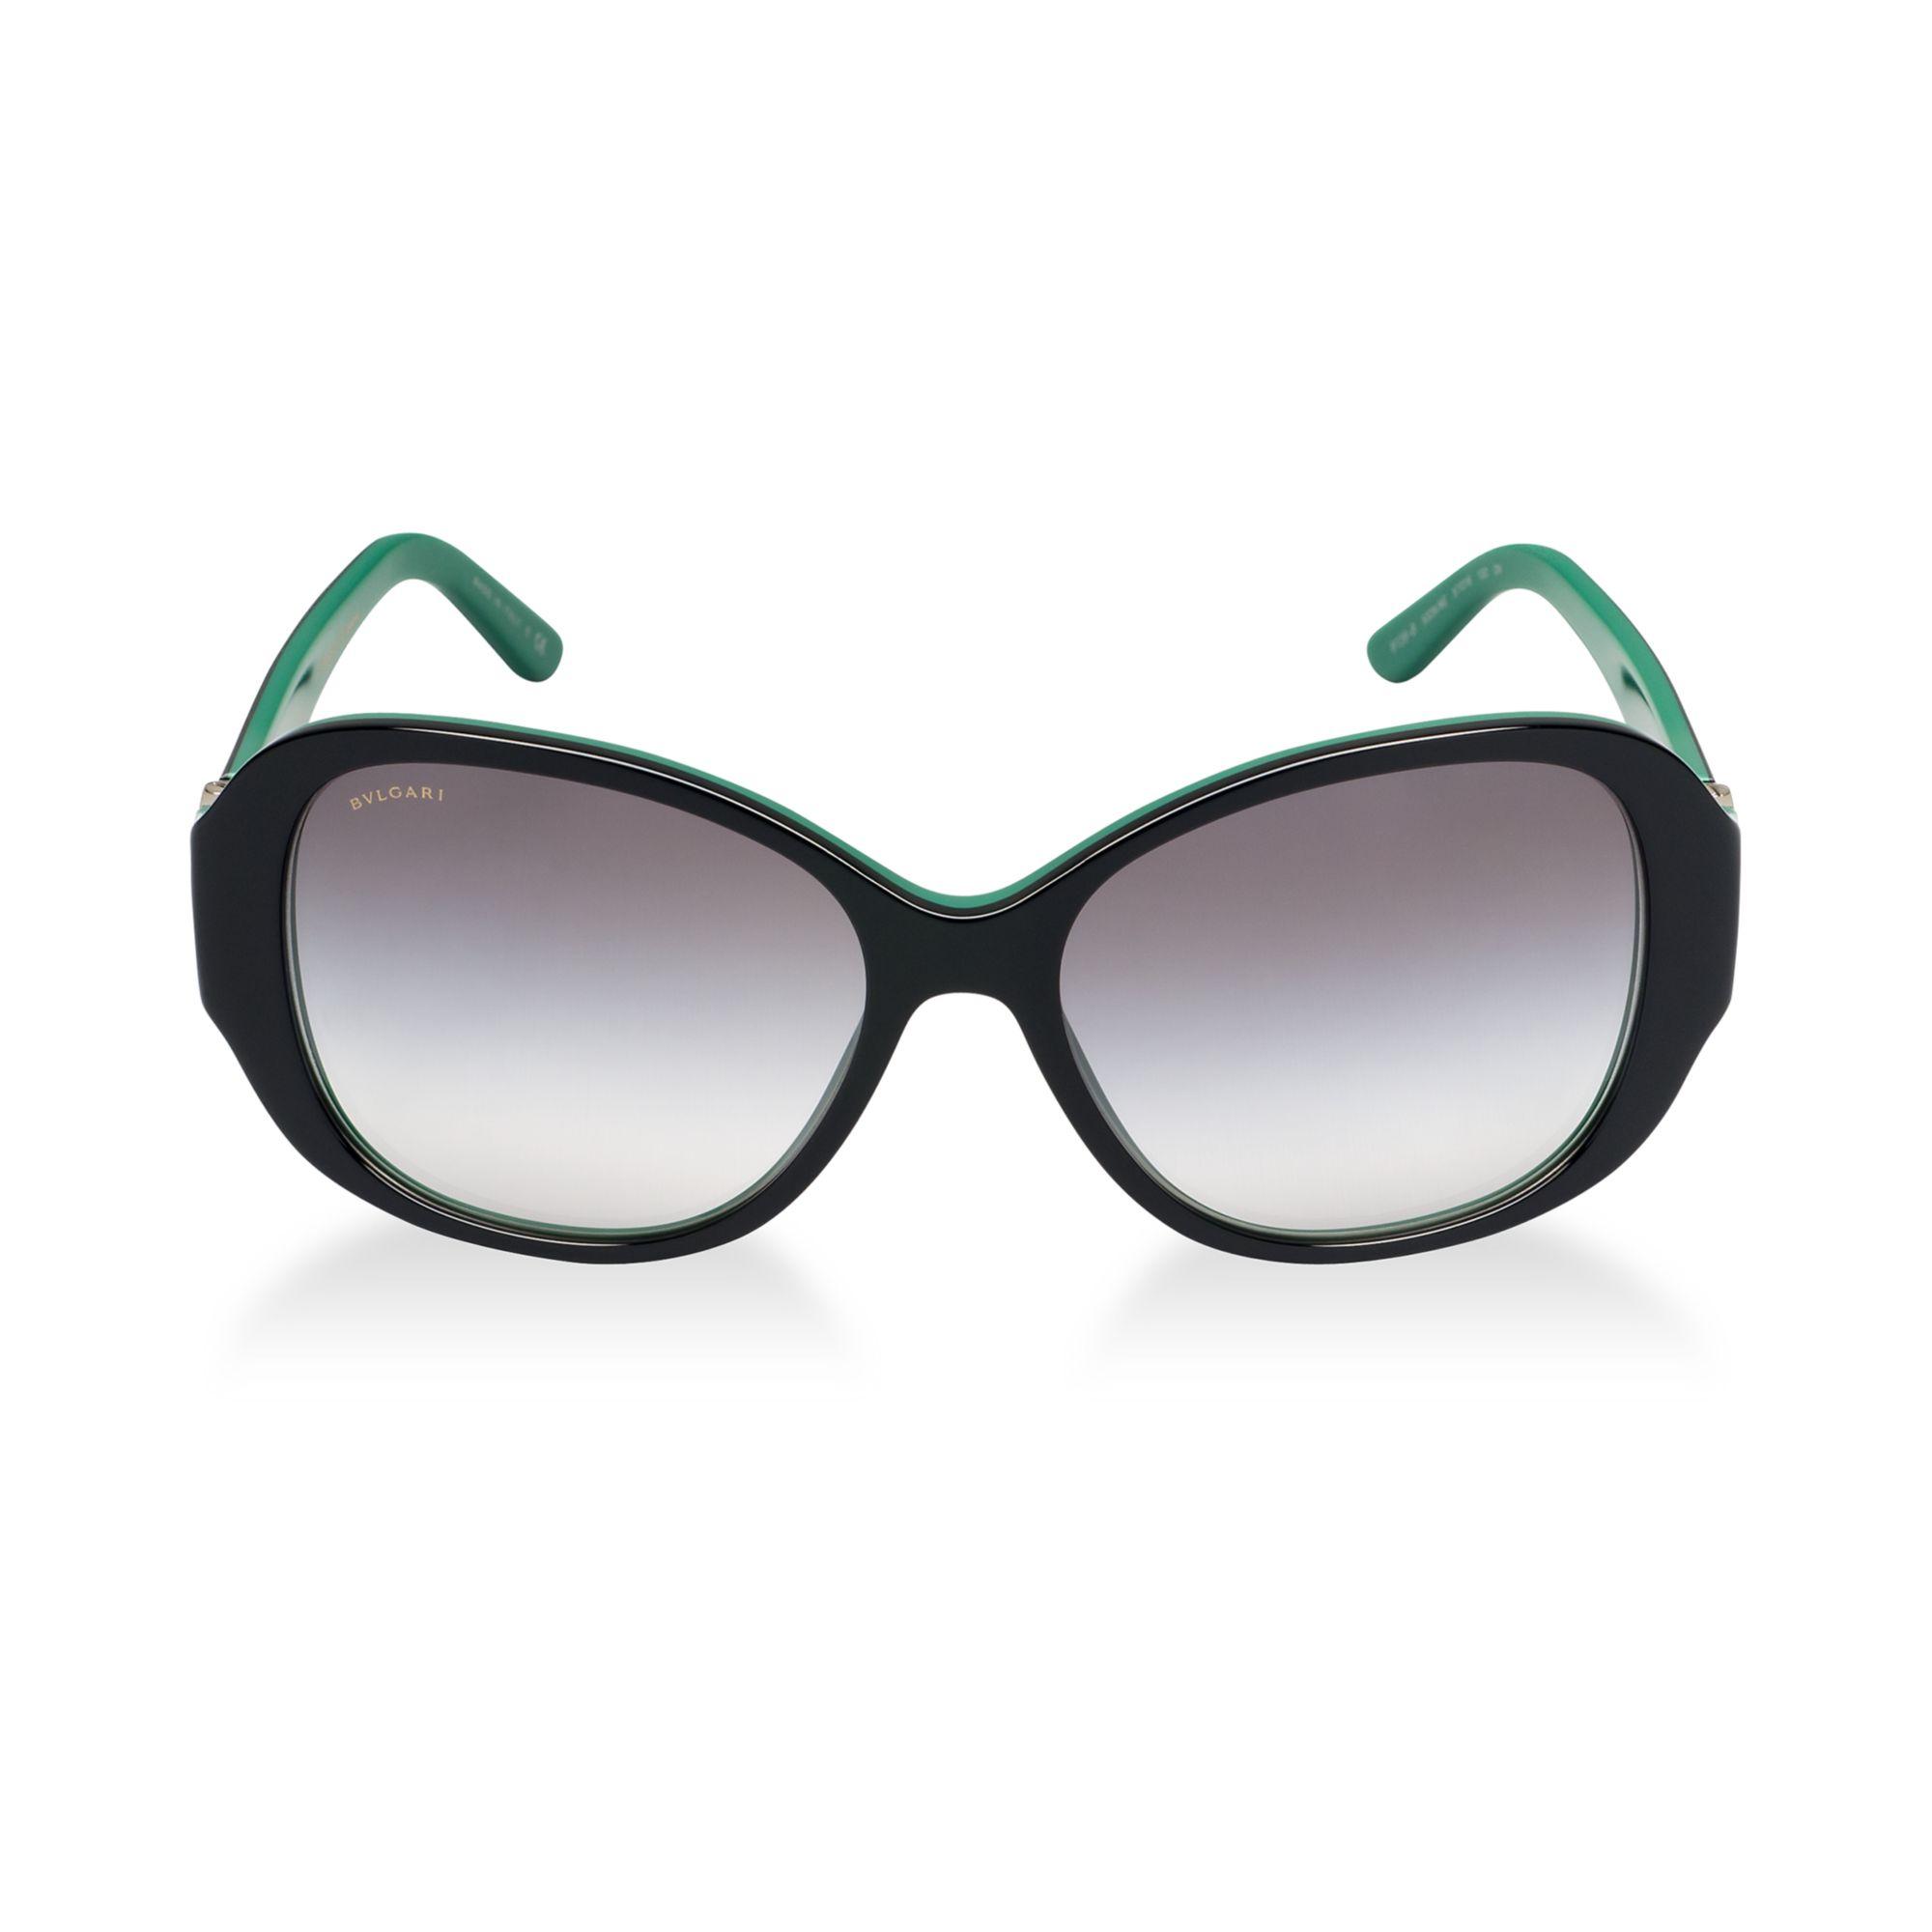 bvlgari sunglasses 57 in green lyst